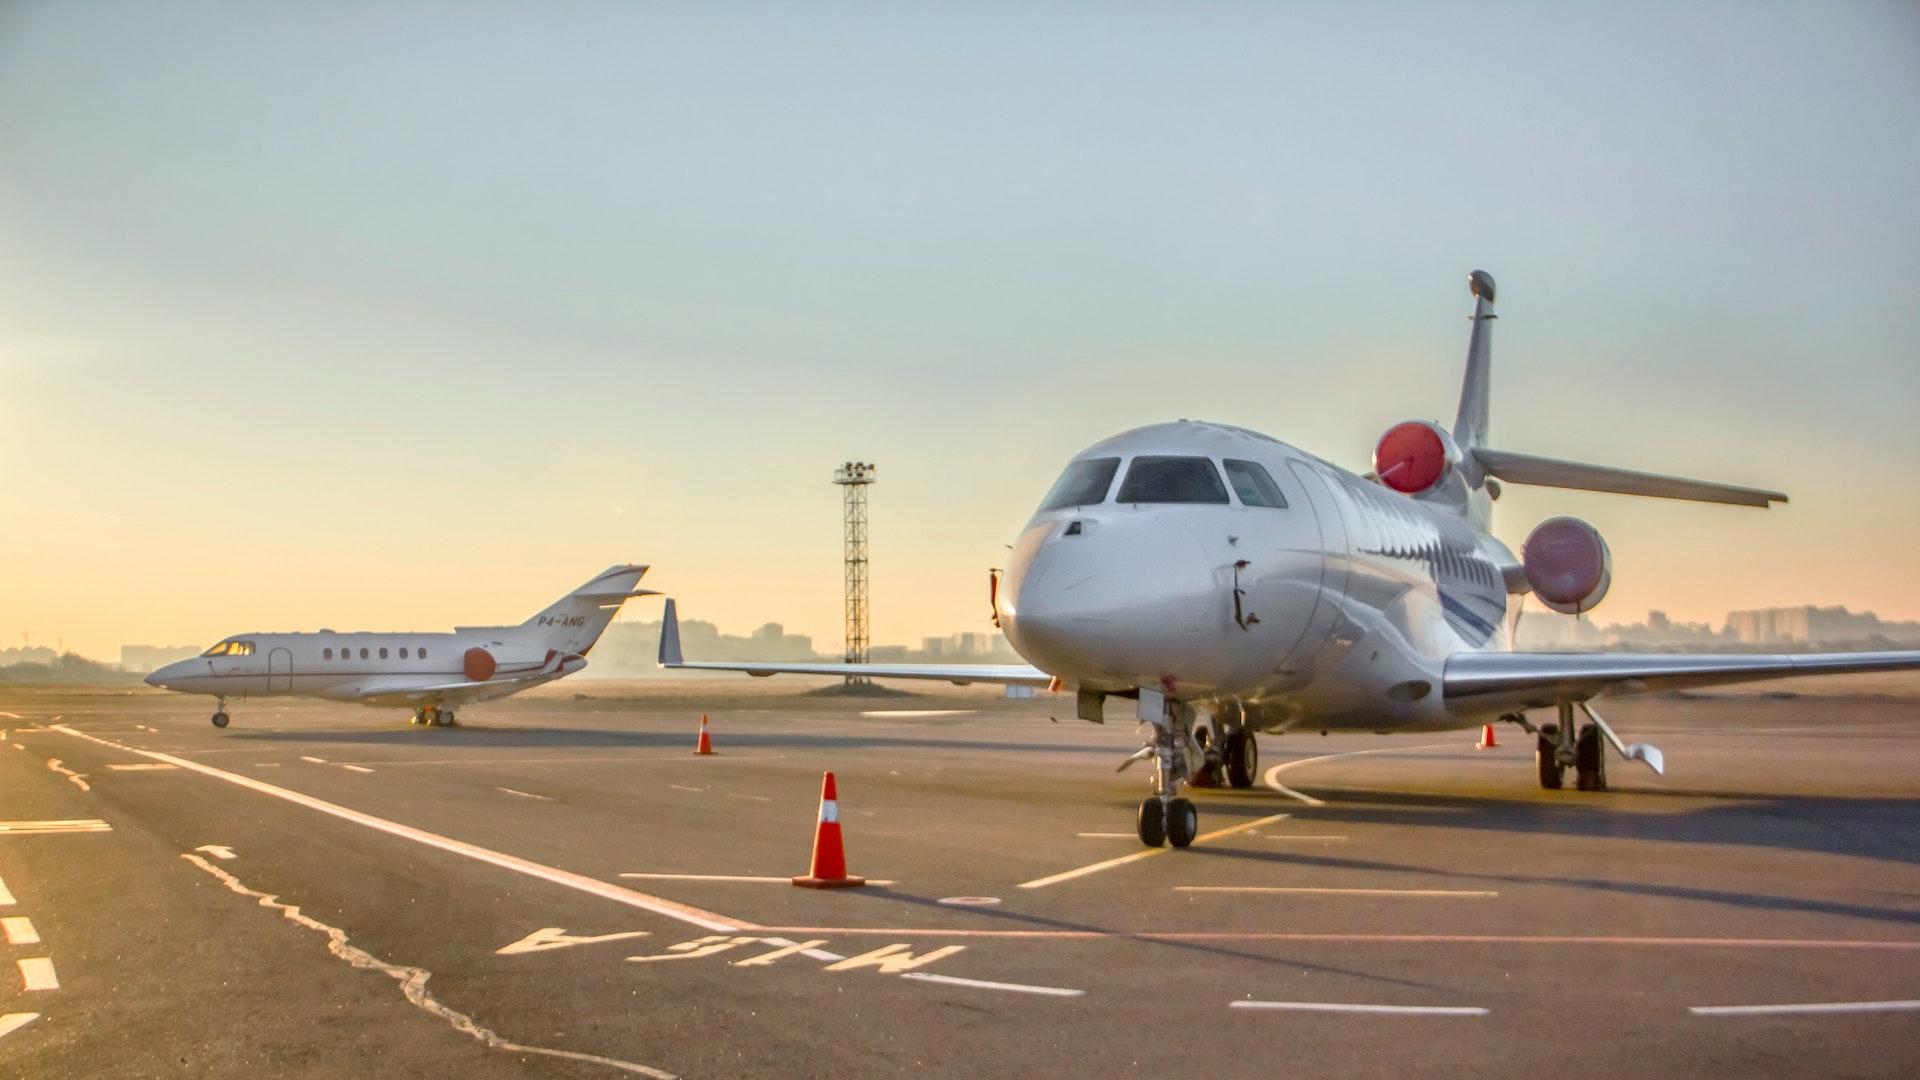 Jet Aircraft Parked